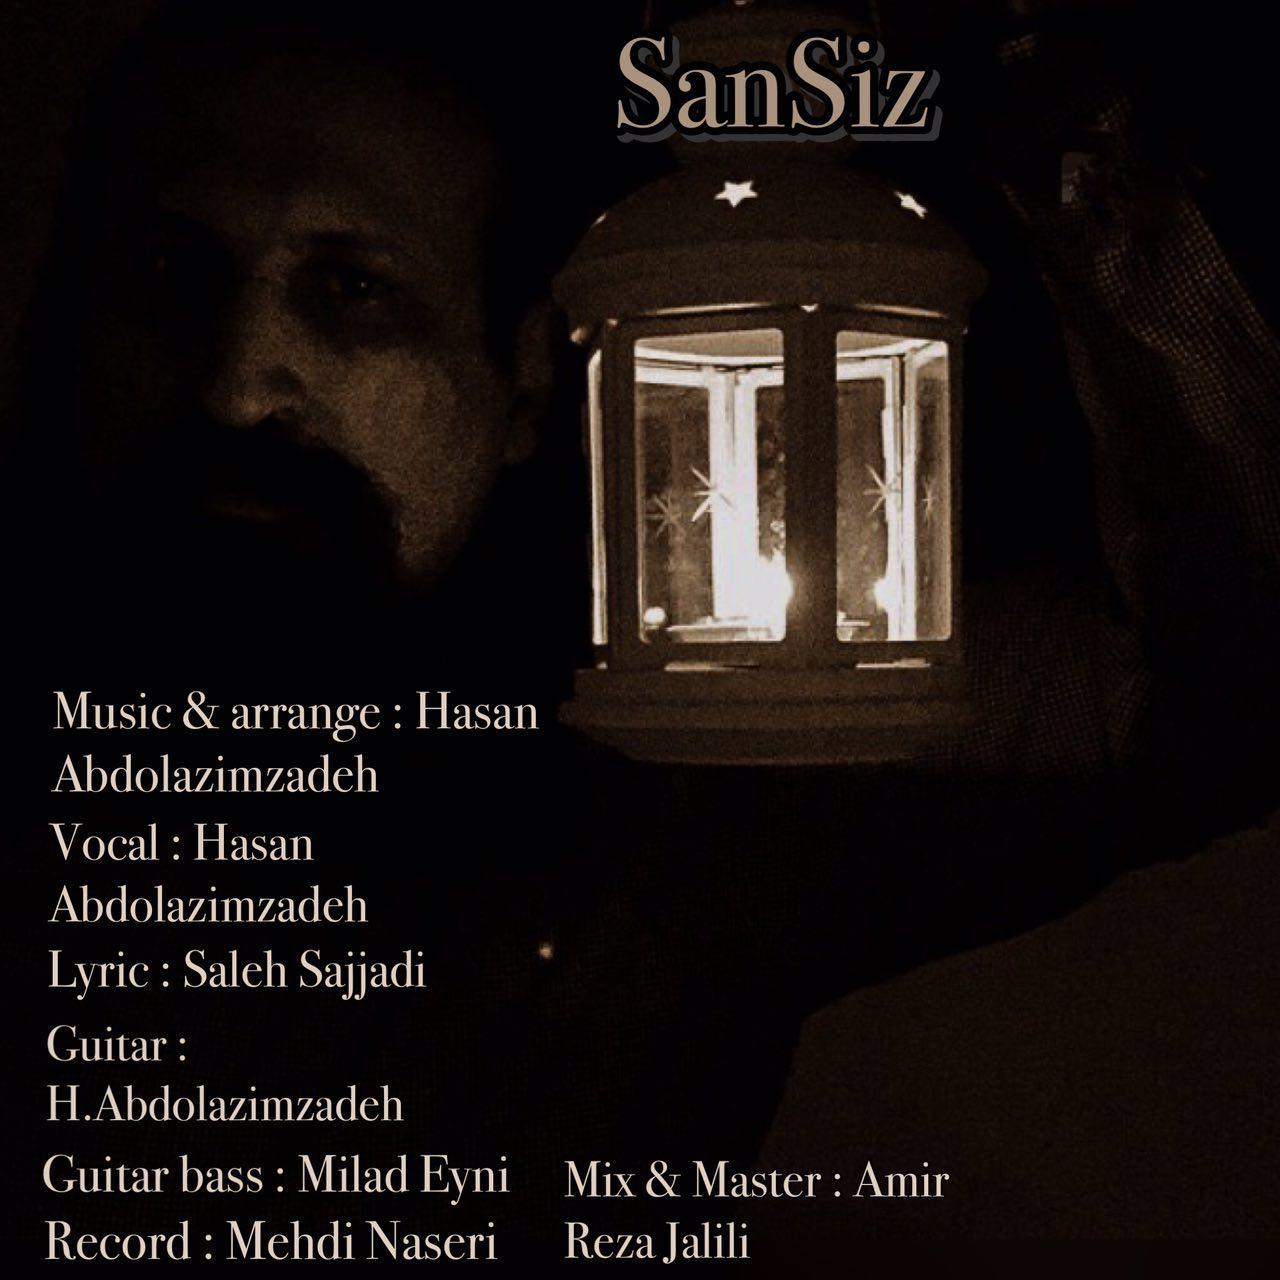 http://s8.picofile.com/file/8337162950/14Hasan_Abdolazimzadeh_San_Siz.jpg